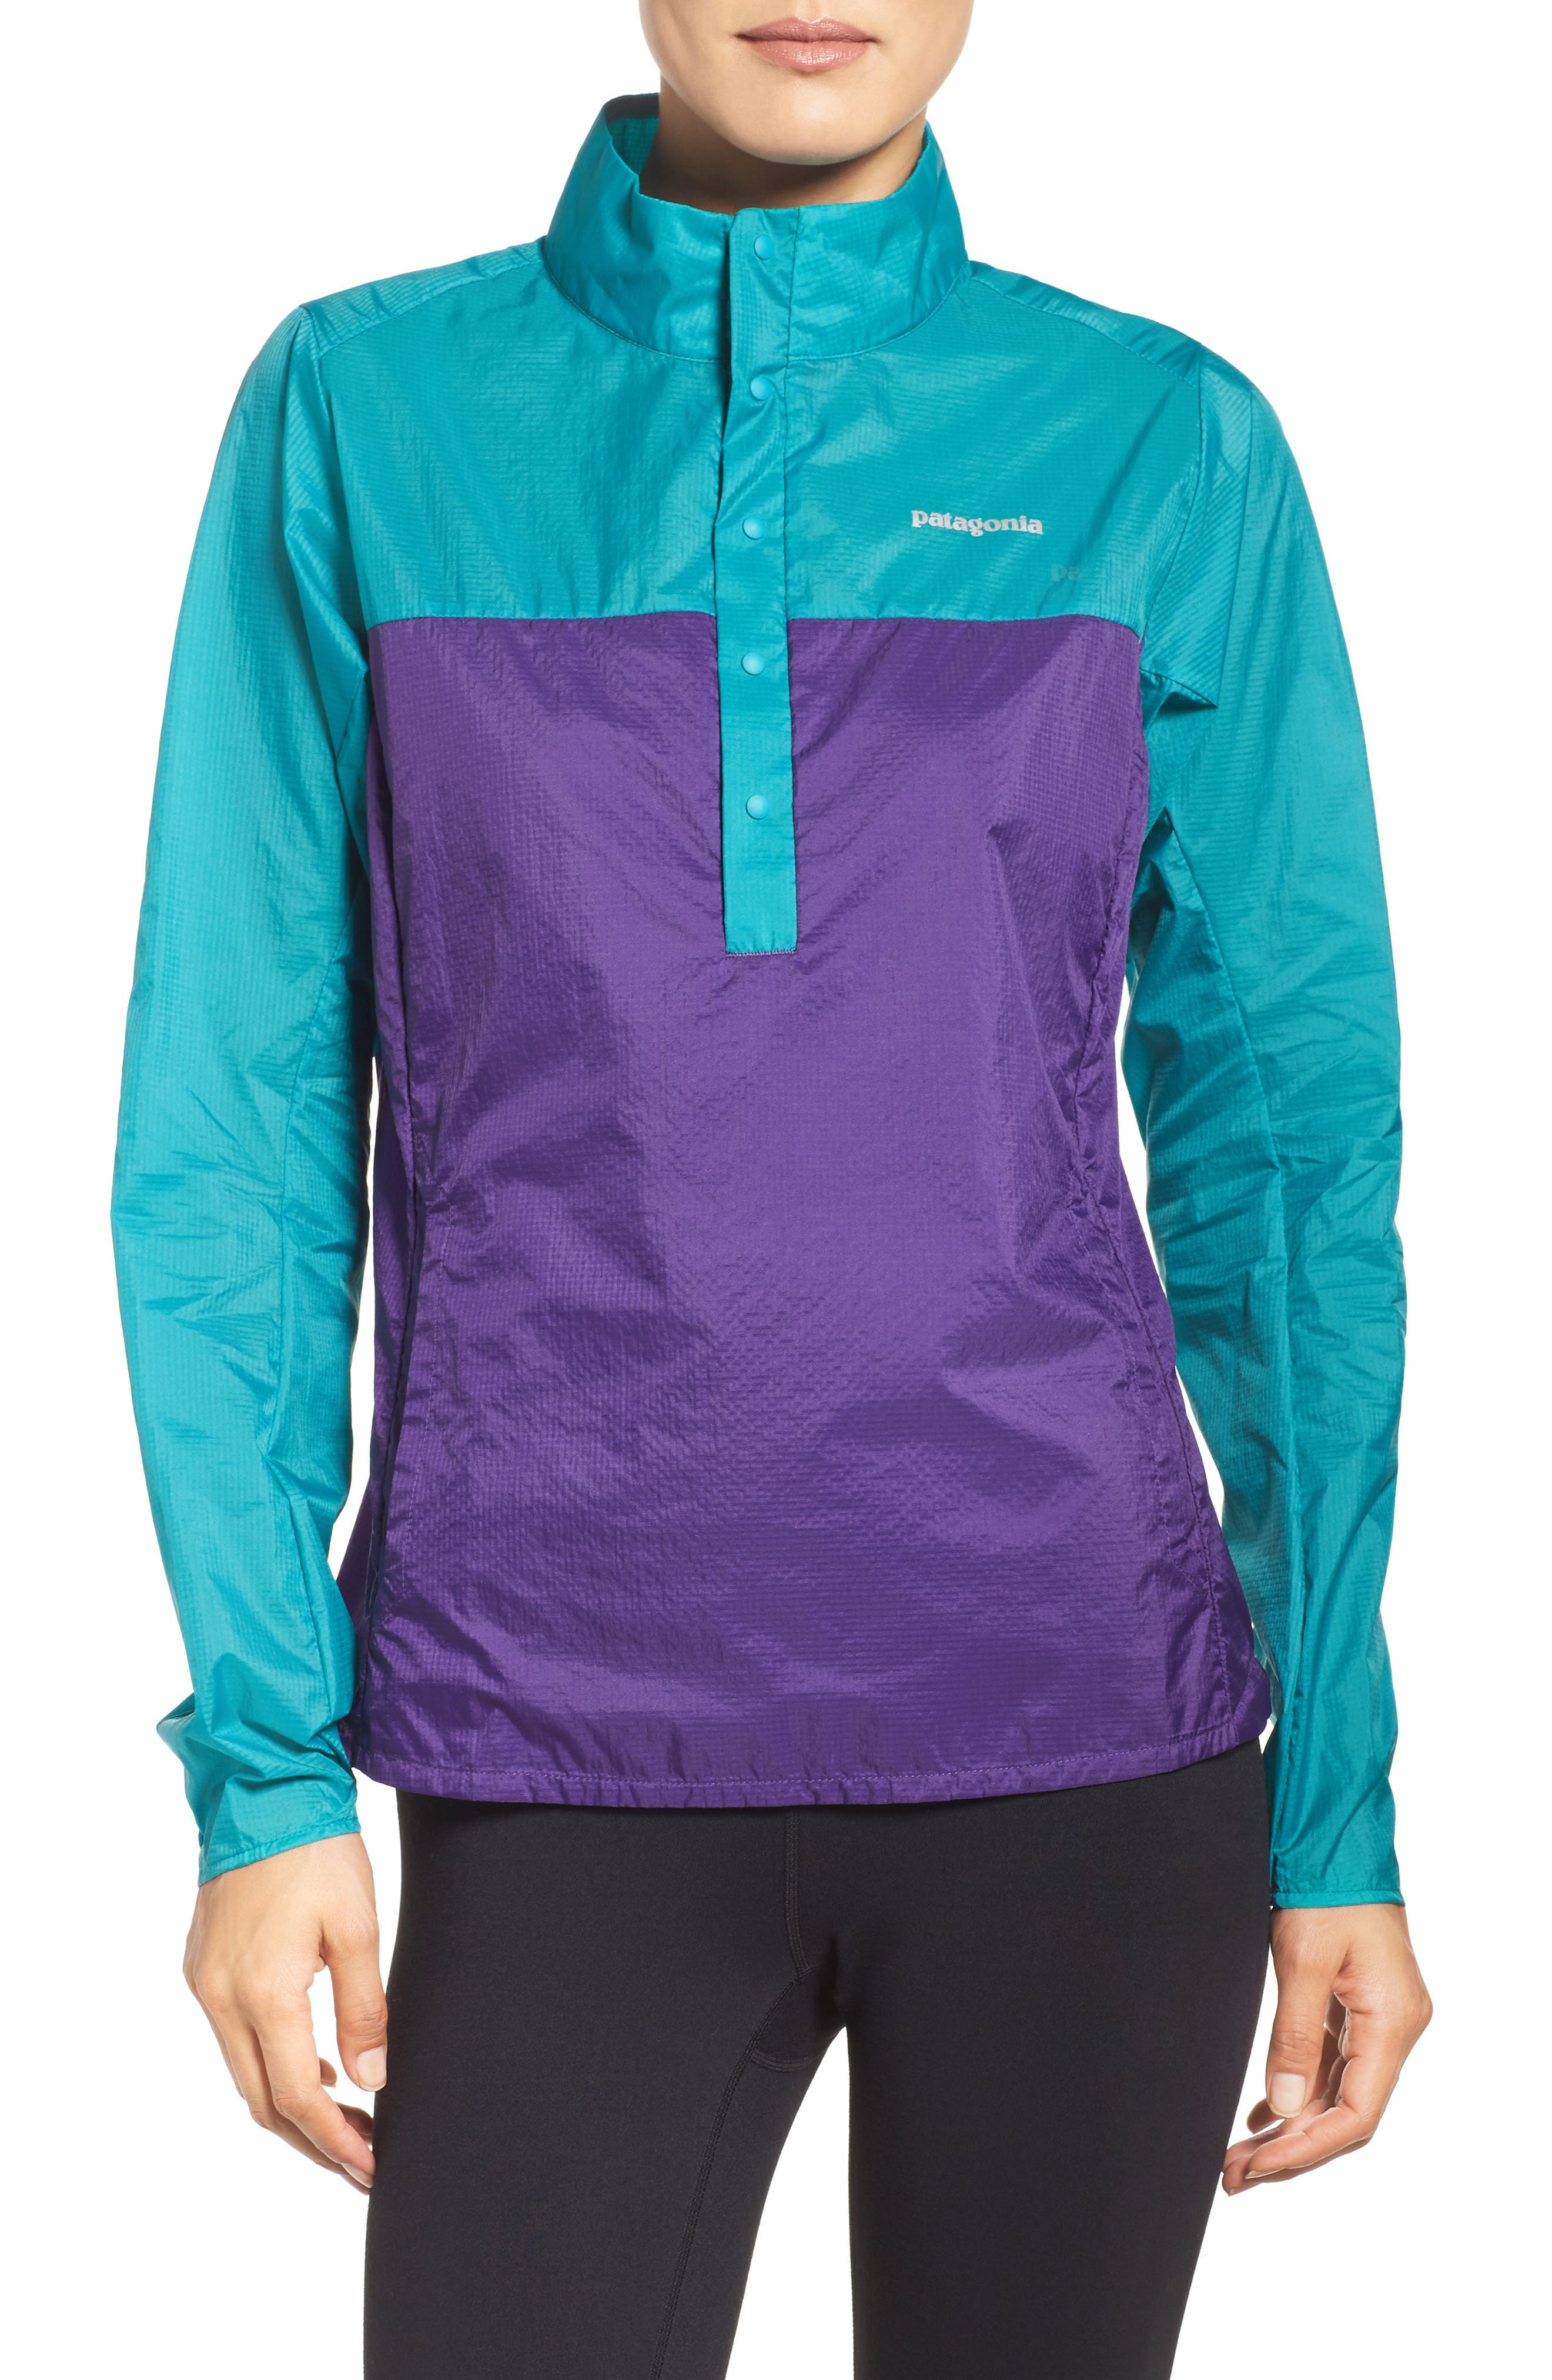 Alternate Image 1 Selected - Patagonia Houdini Water Repellent Jacket